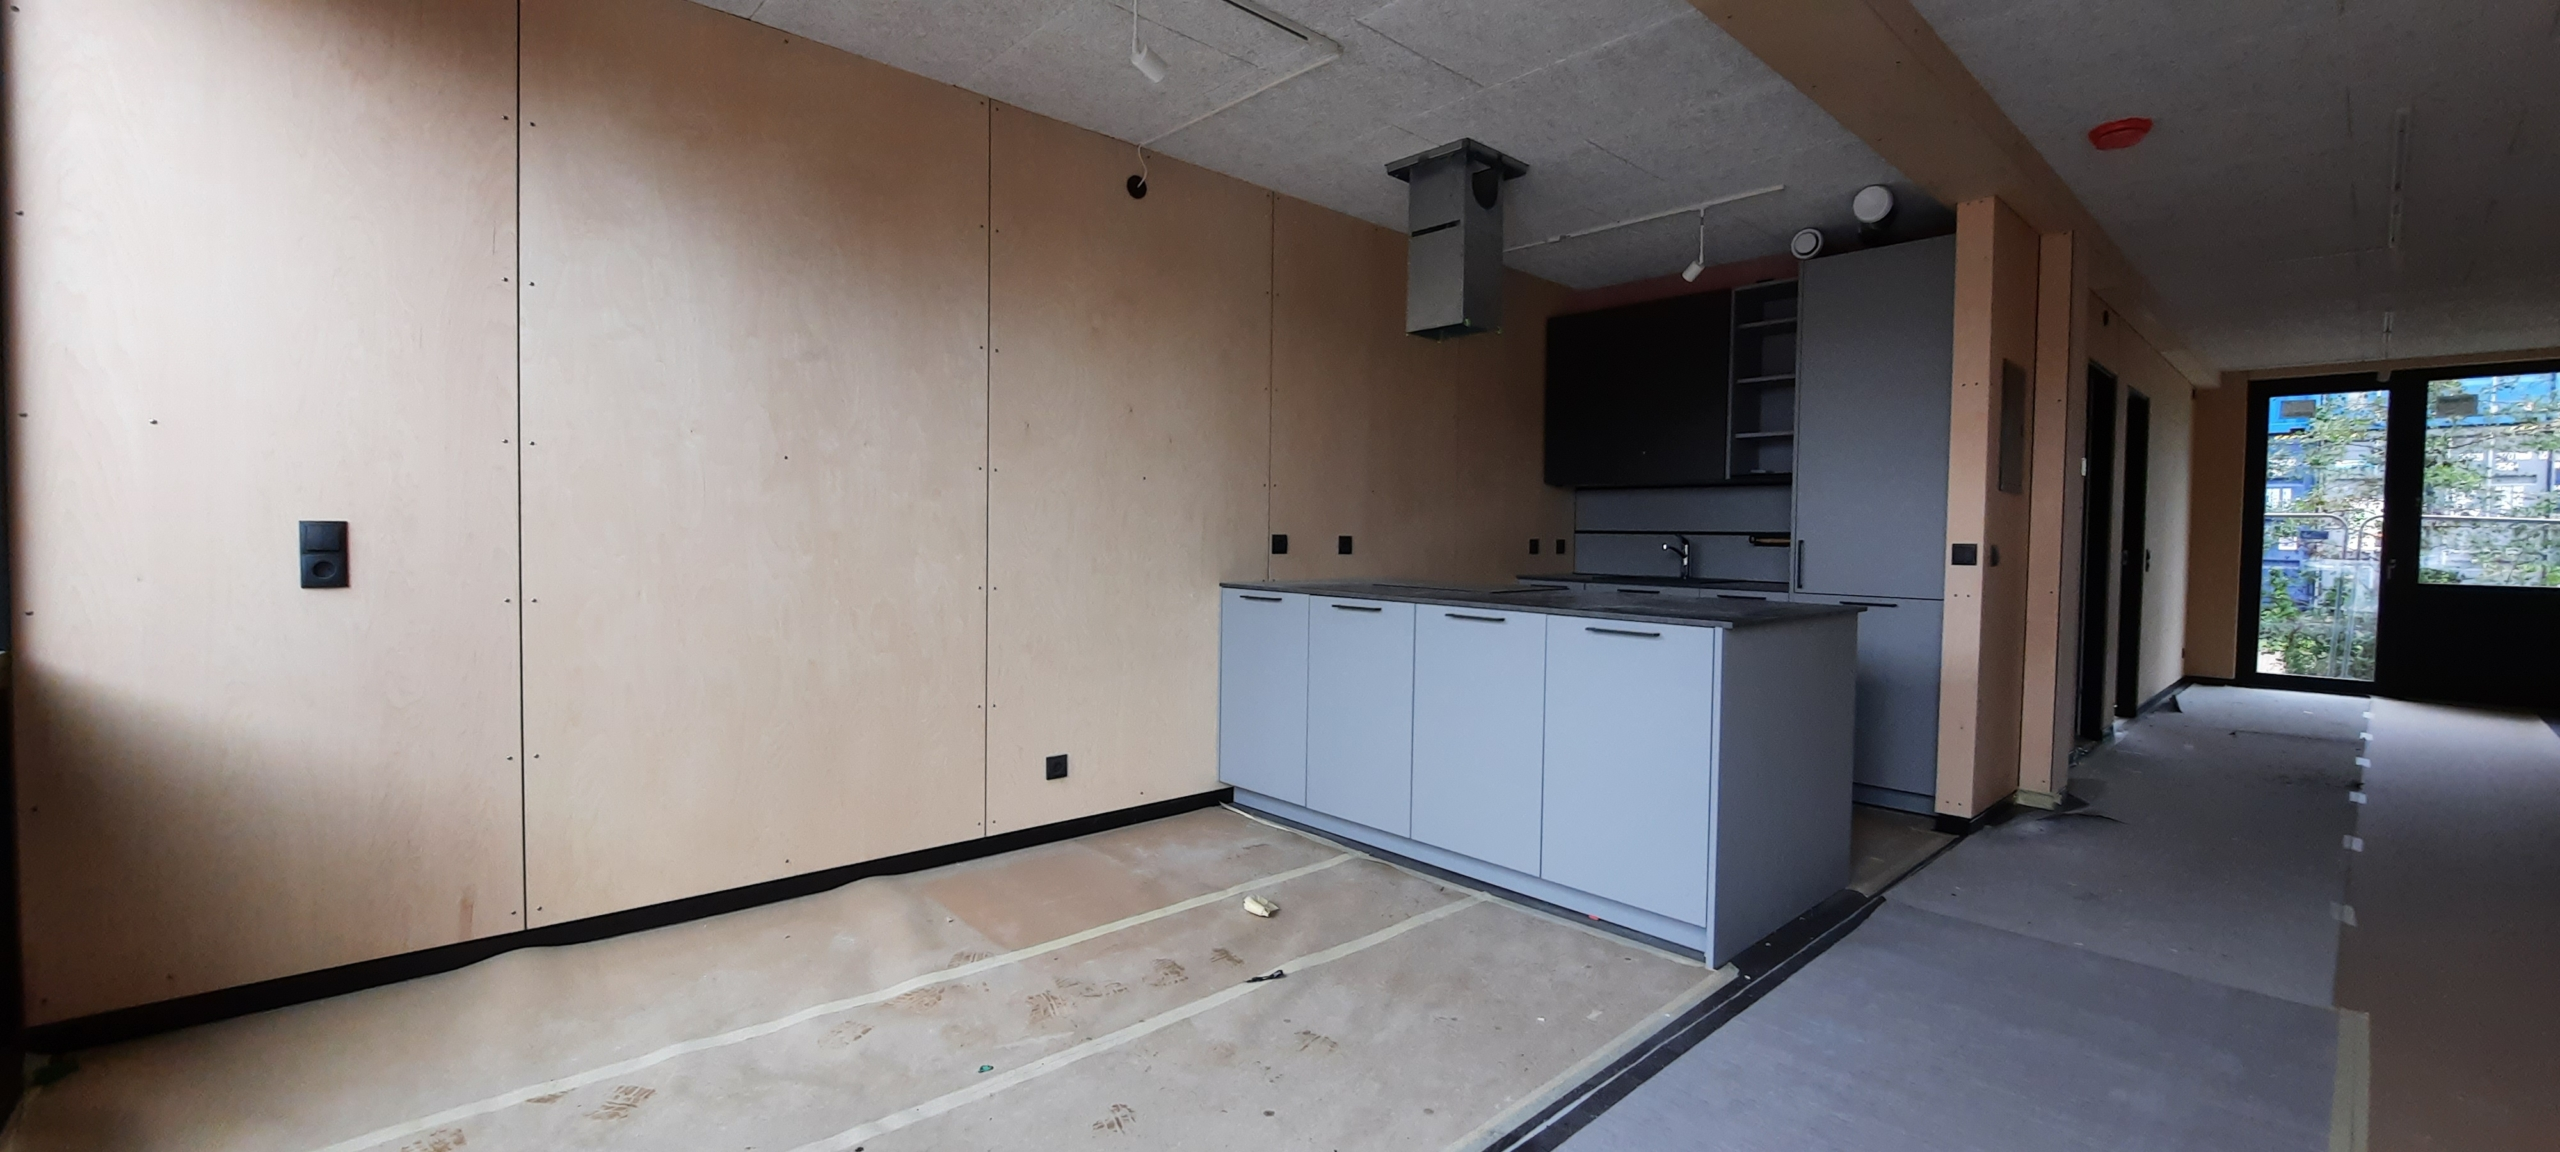 Køkken 60m2 bolig | Container Living Musicon